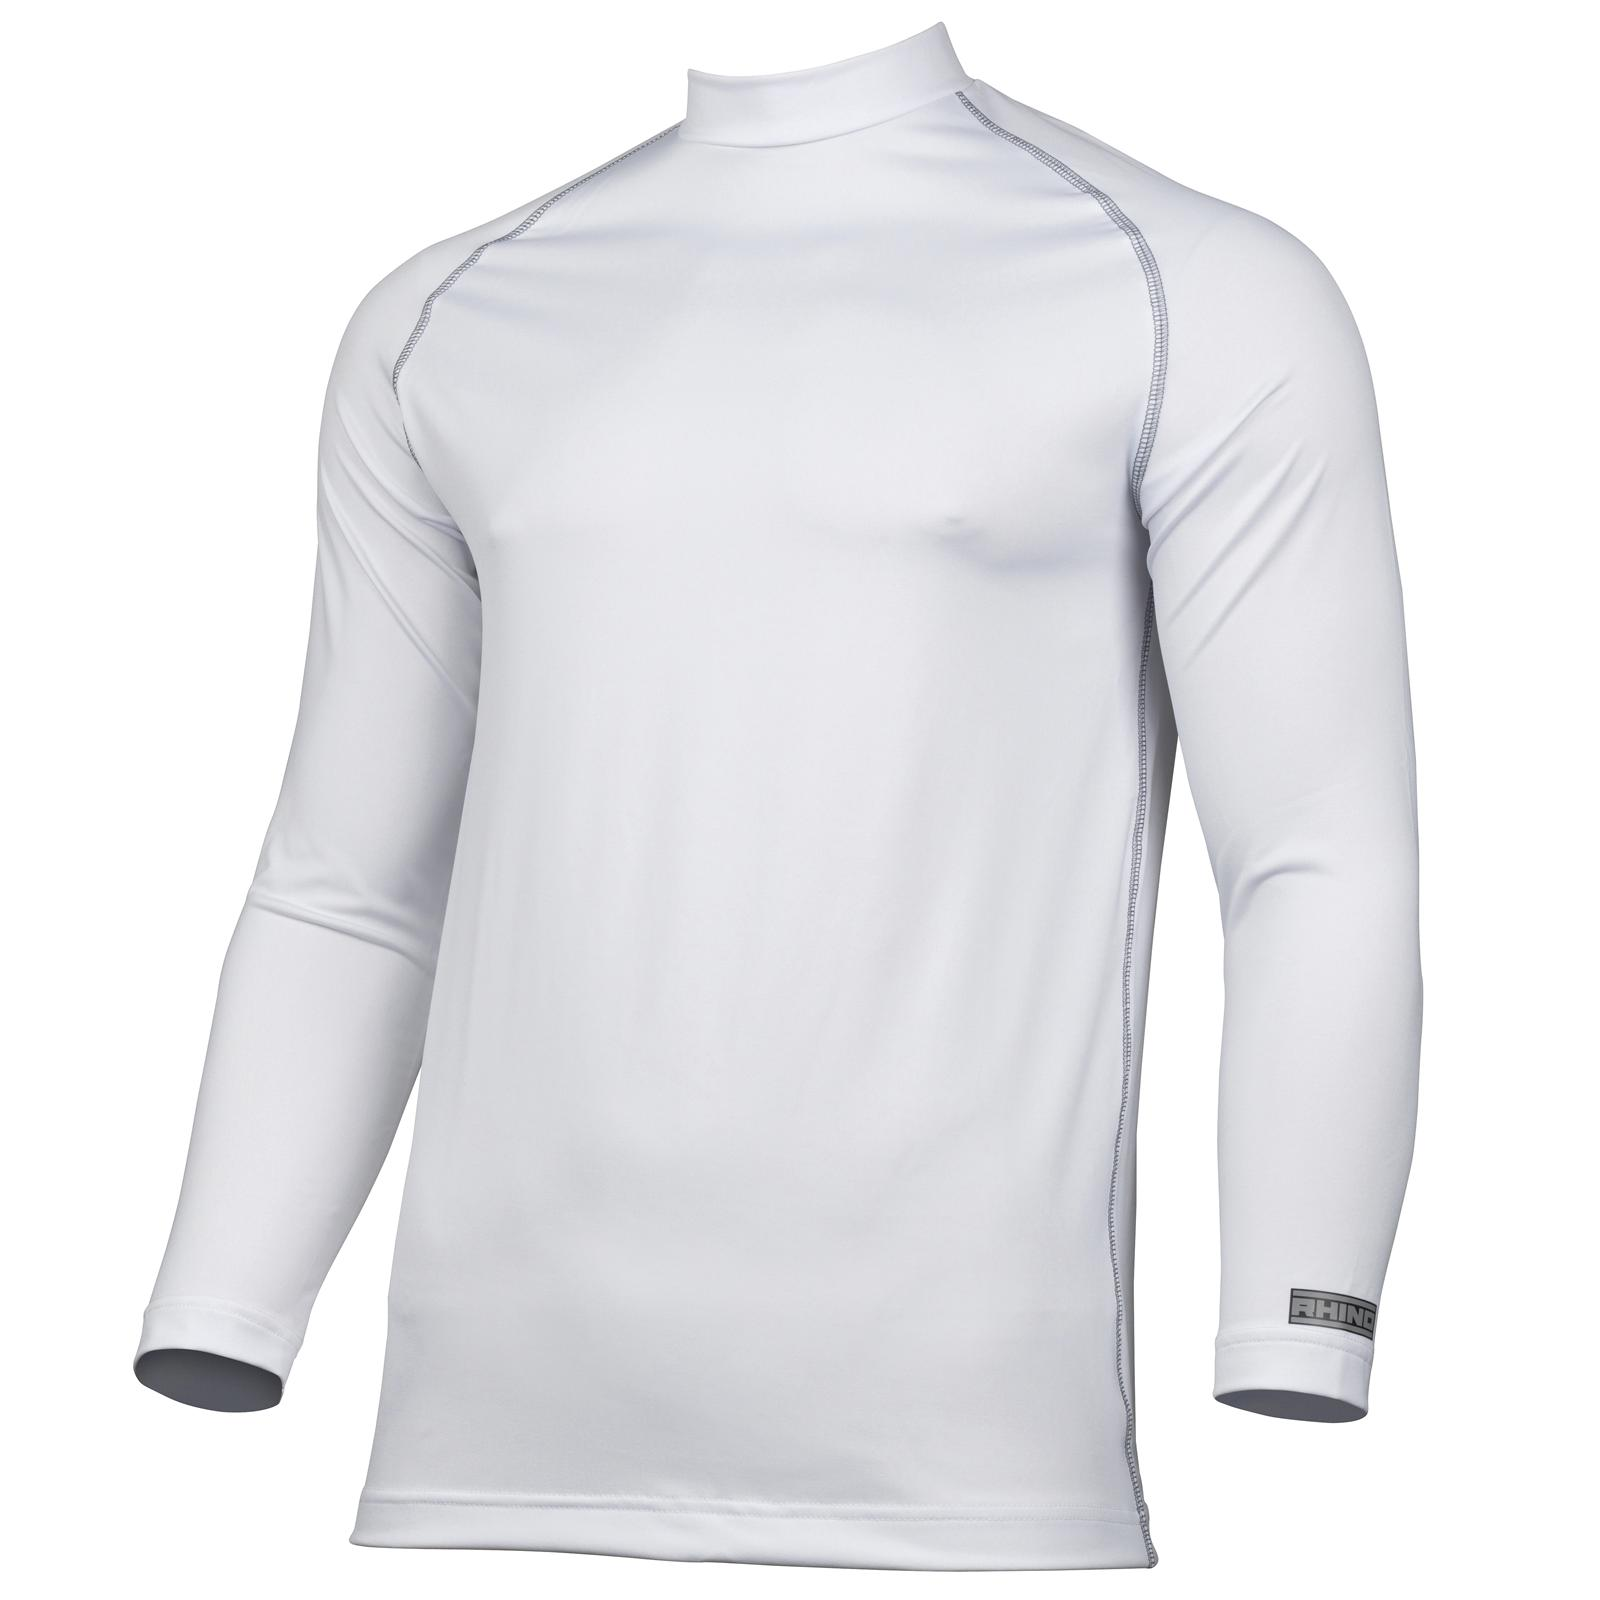 T shirt white colour - New Rhino Unisex Adults Sports Long Sleeve Base